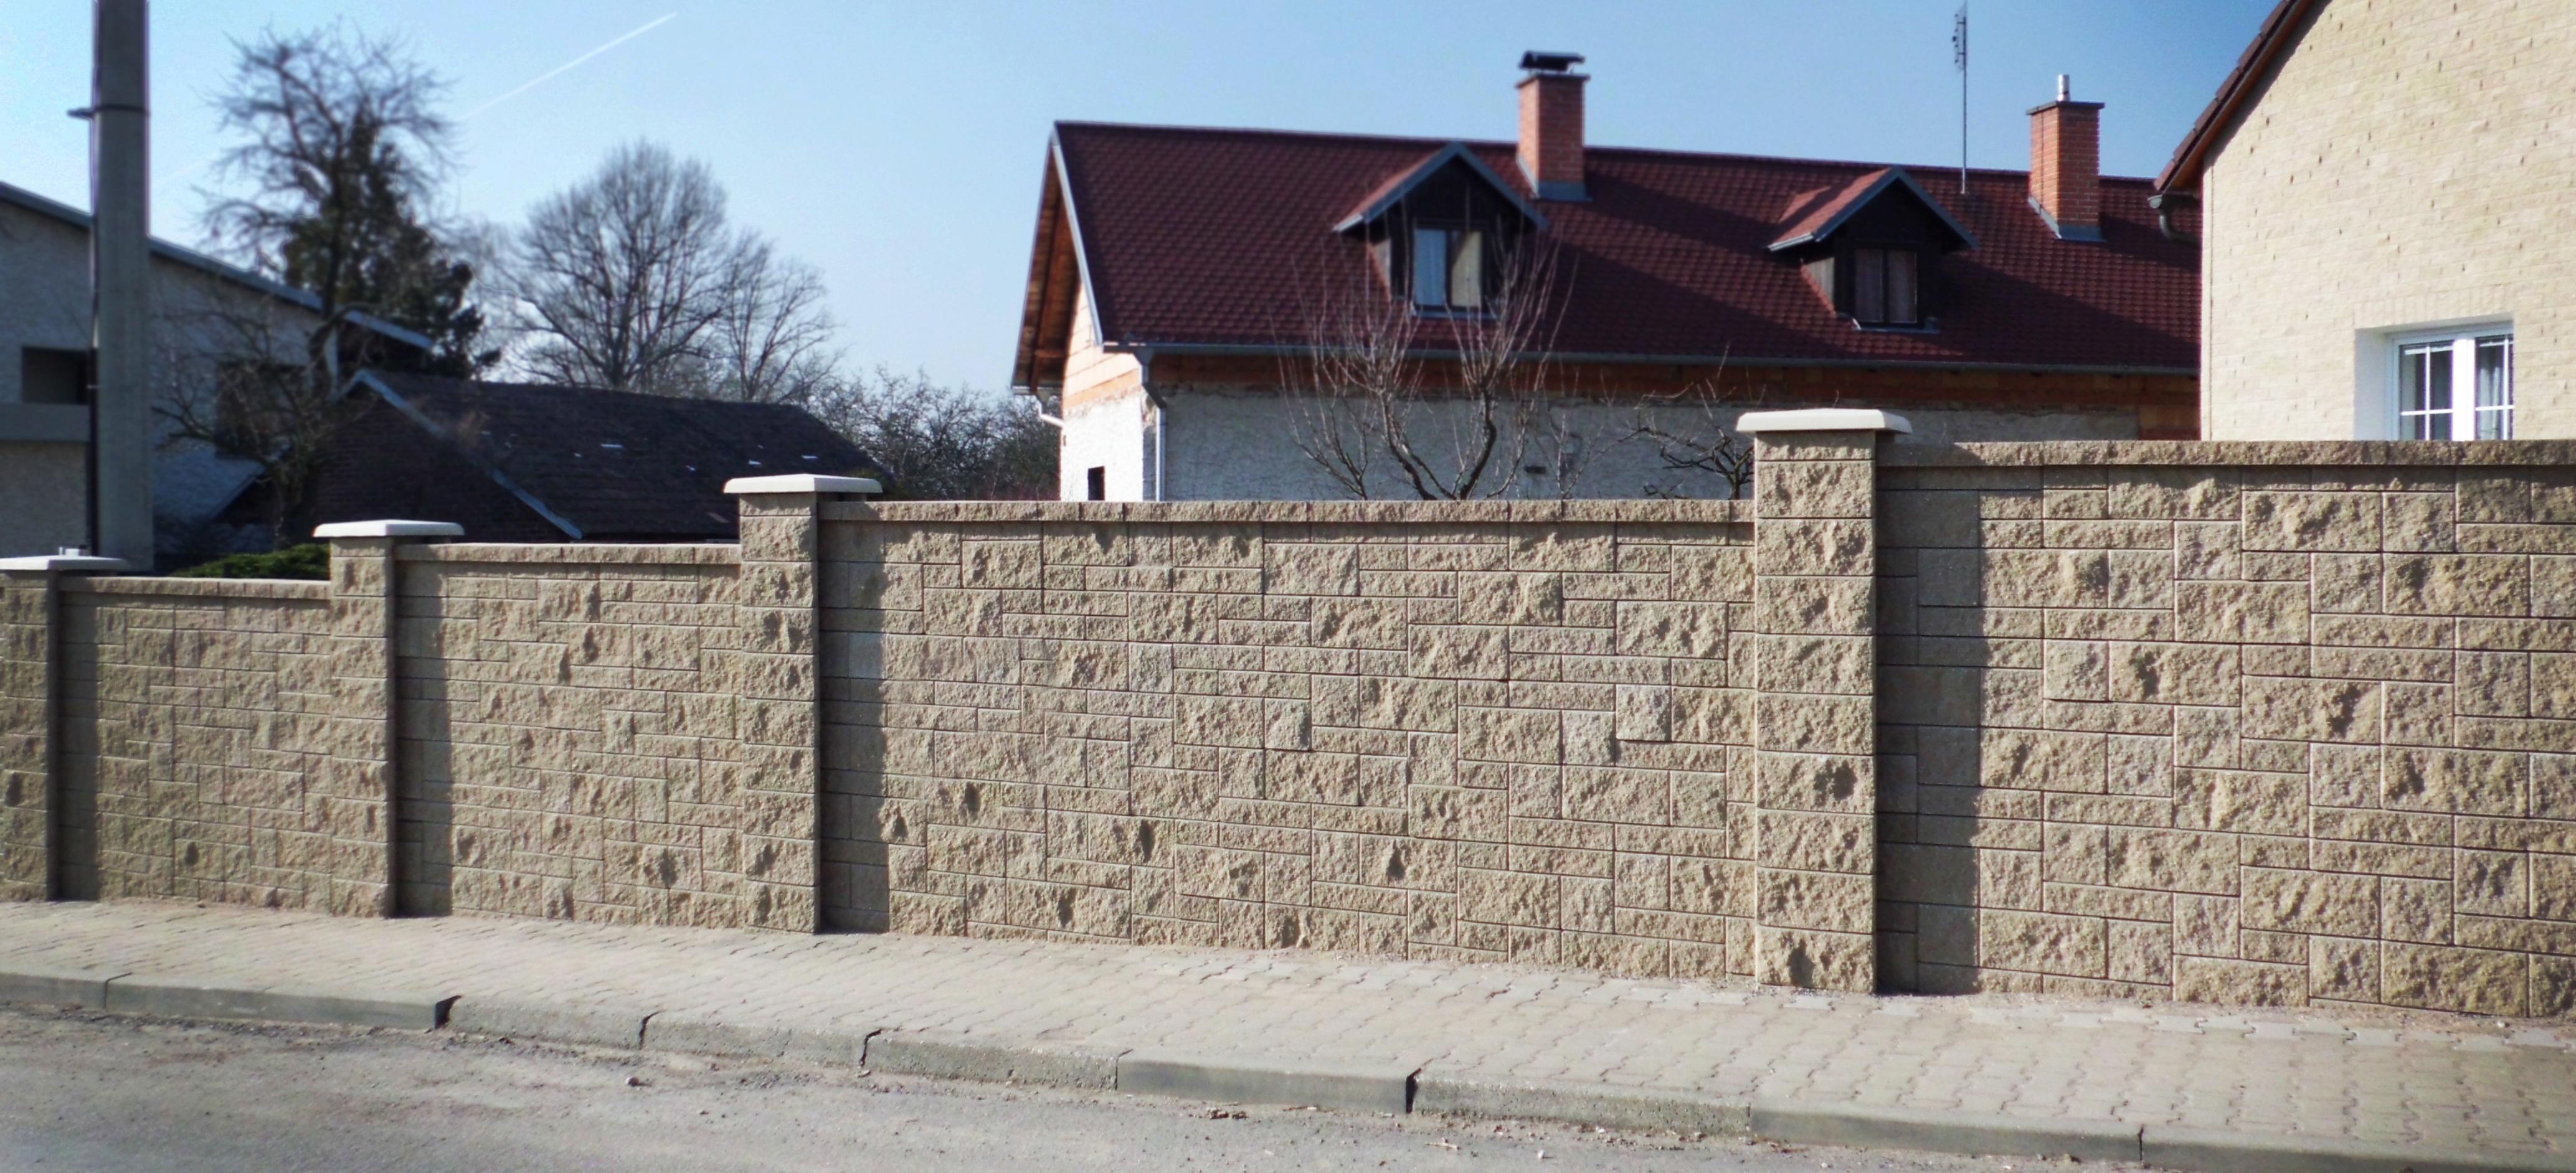 Stavoblock boundary wall